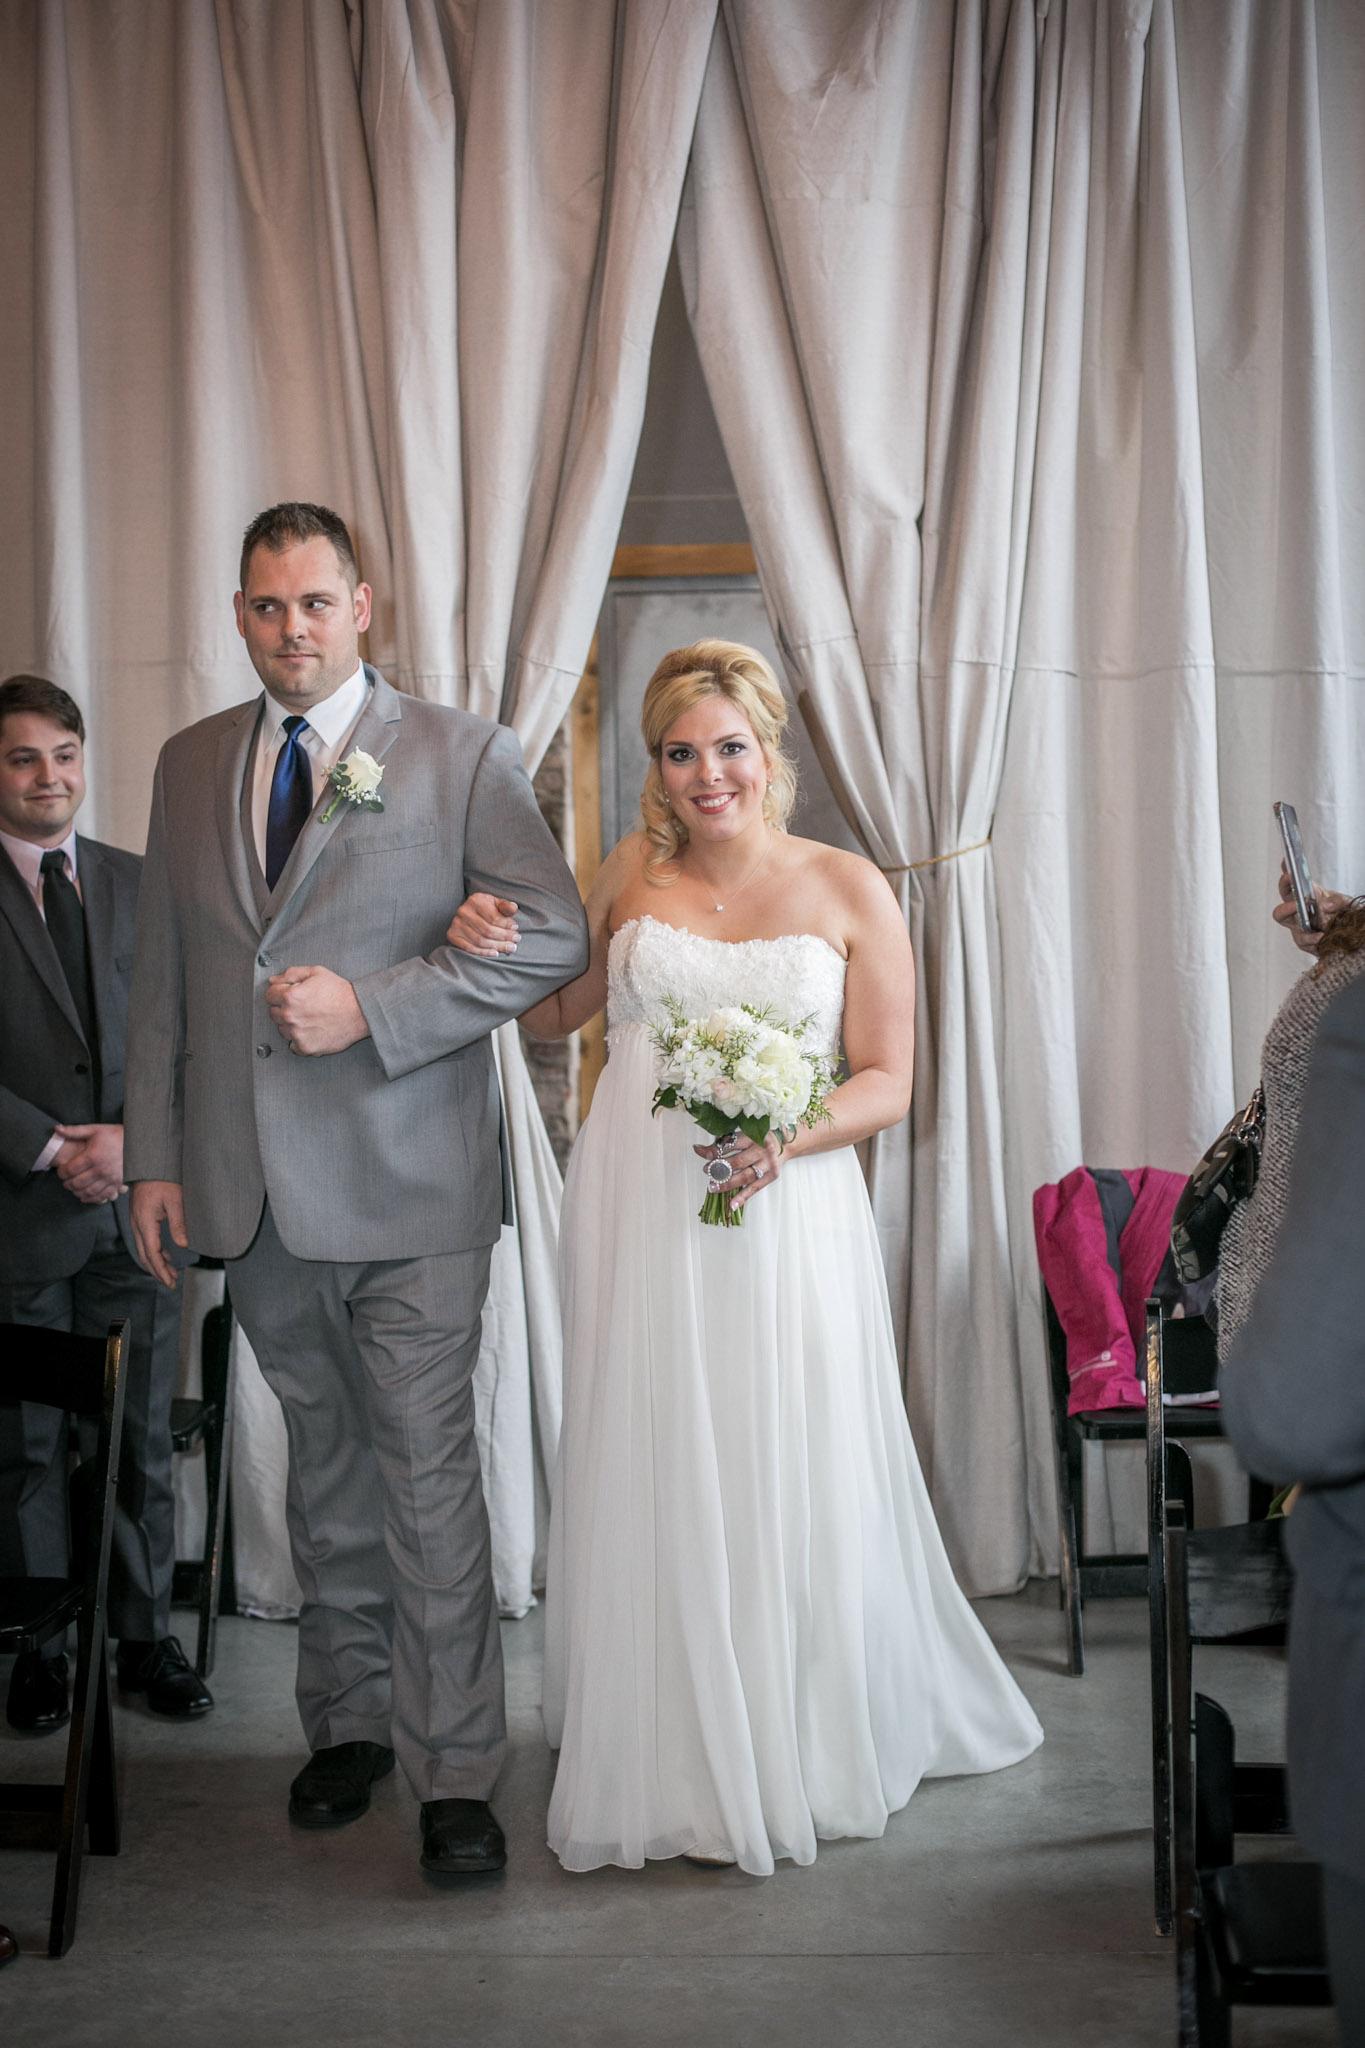 The_Vow_Exchange_Kansas_City_Small_Budget_Wedding_Venue_Andrea&Jon-065.jpg